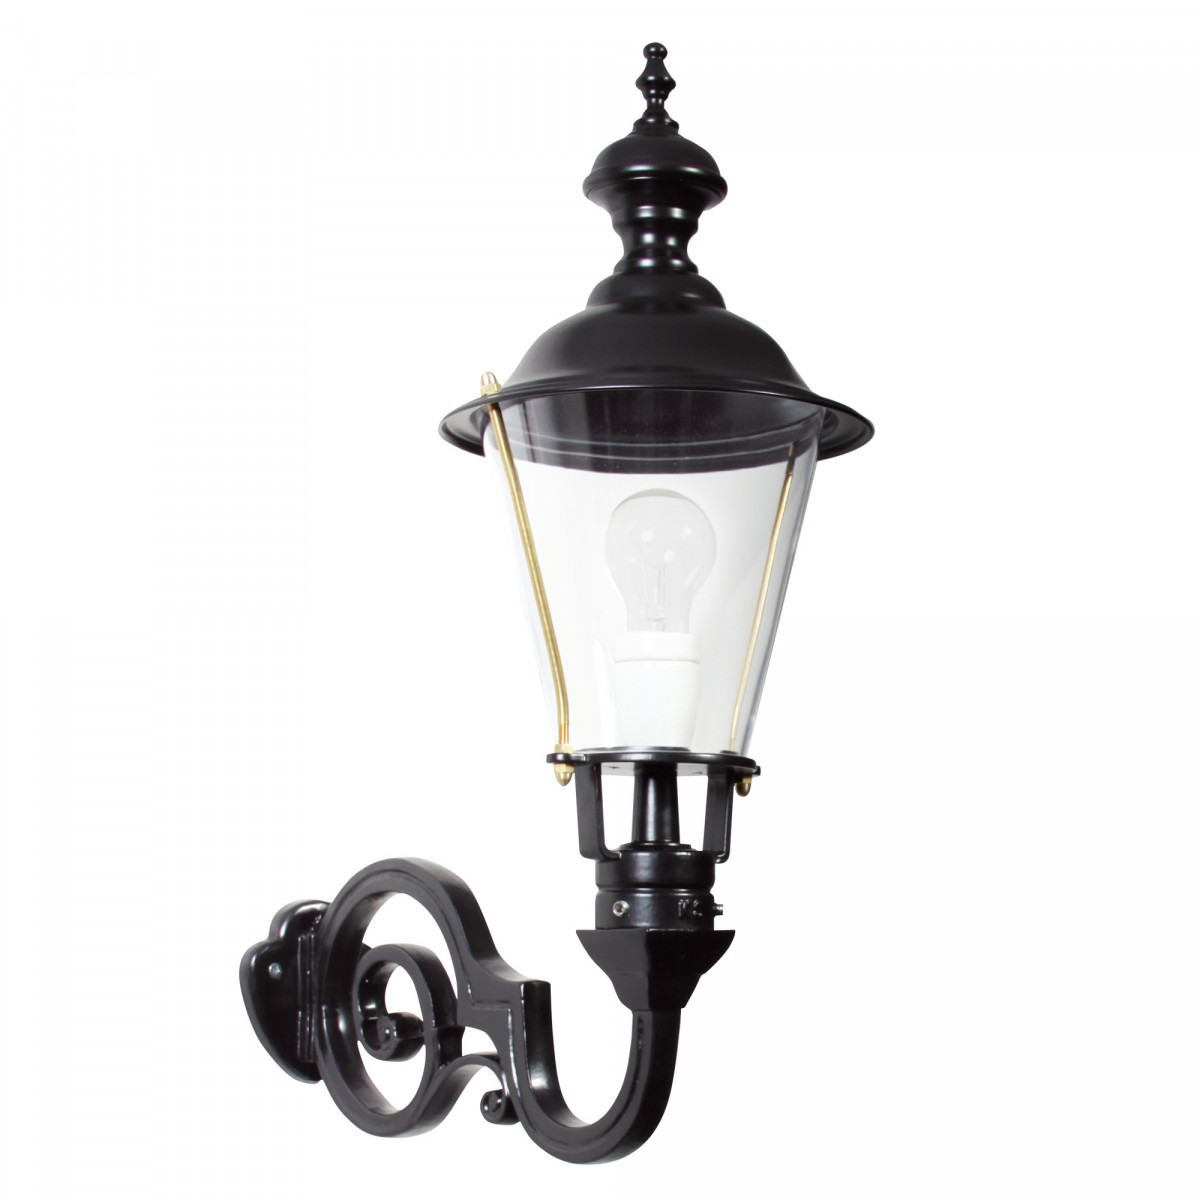 Buitenlamp Amstel M Dag Nacht sensor LED Schemersensor